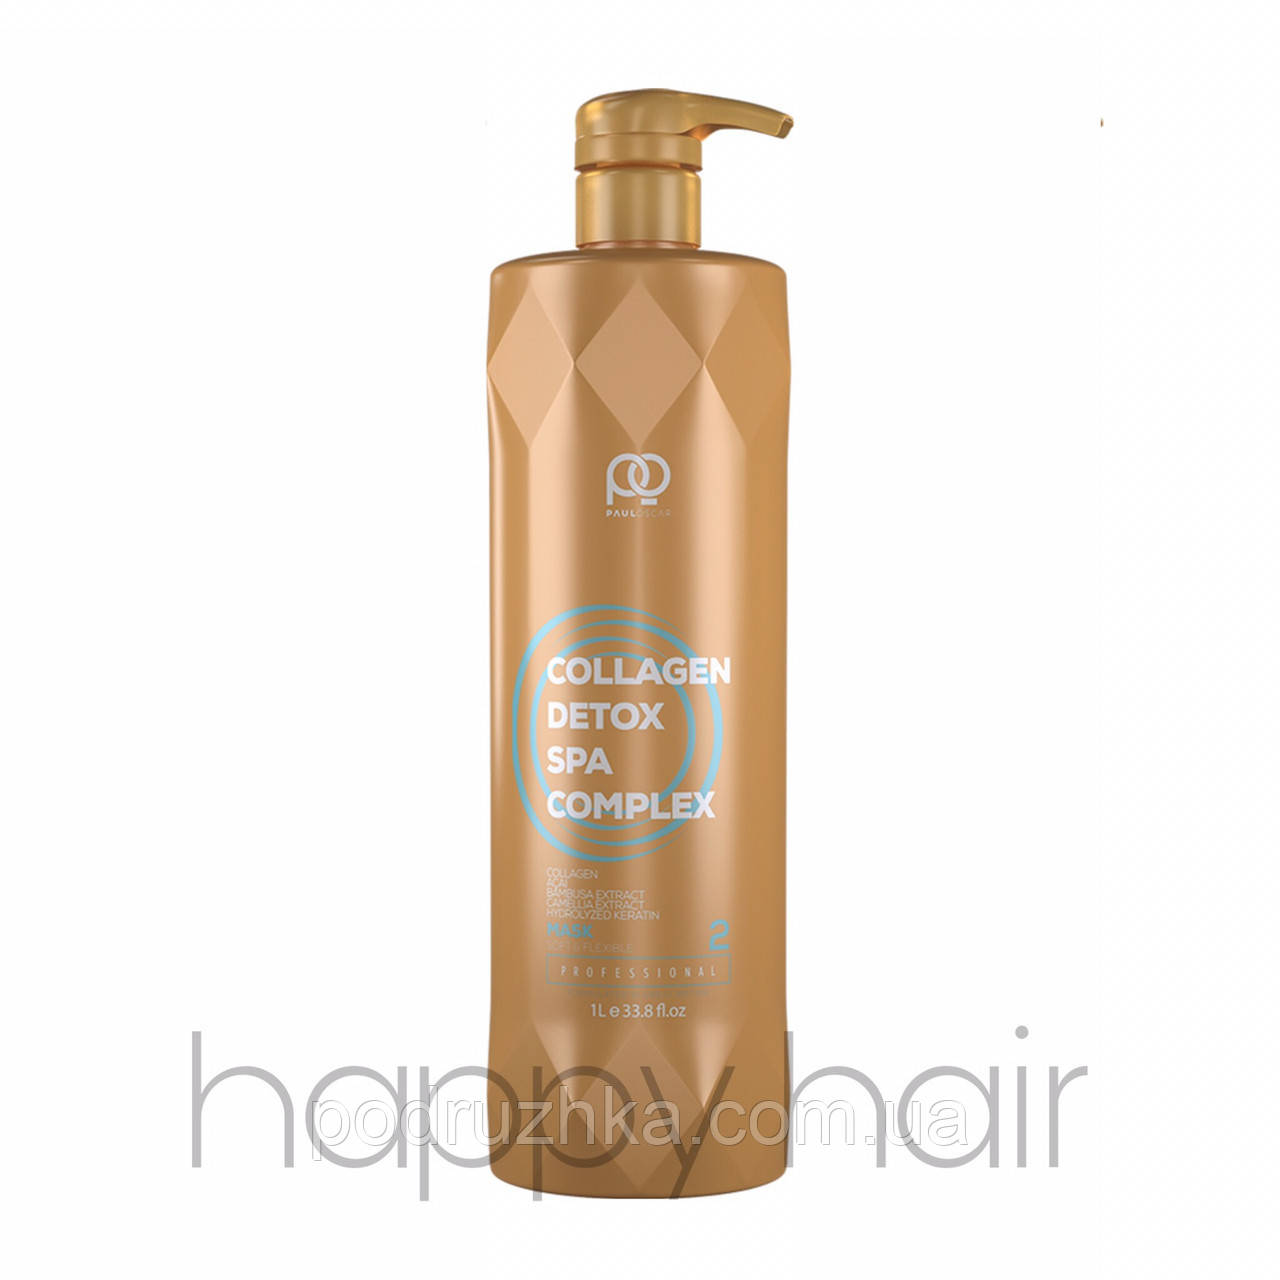 Paul Oscar Collagen Detox SPA Complex Кератин для волос (шаг 2) 1000 мл